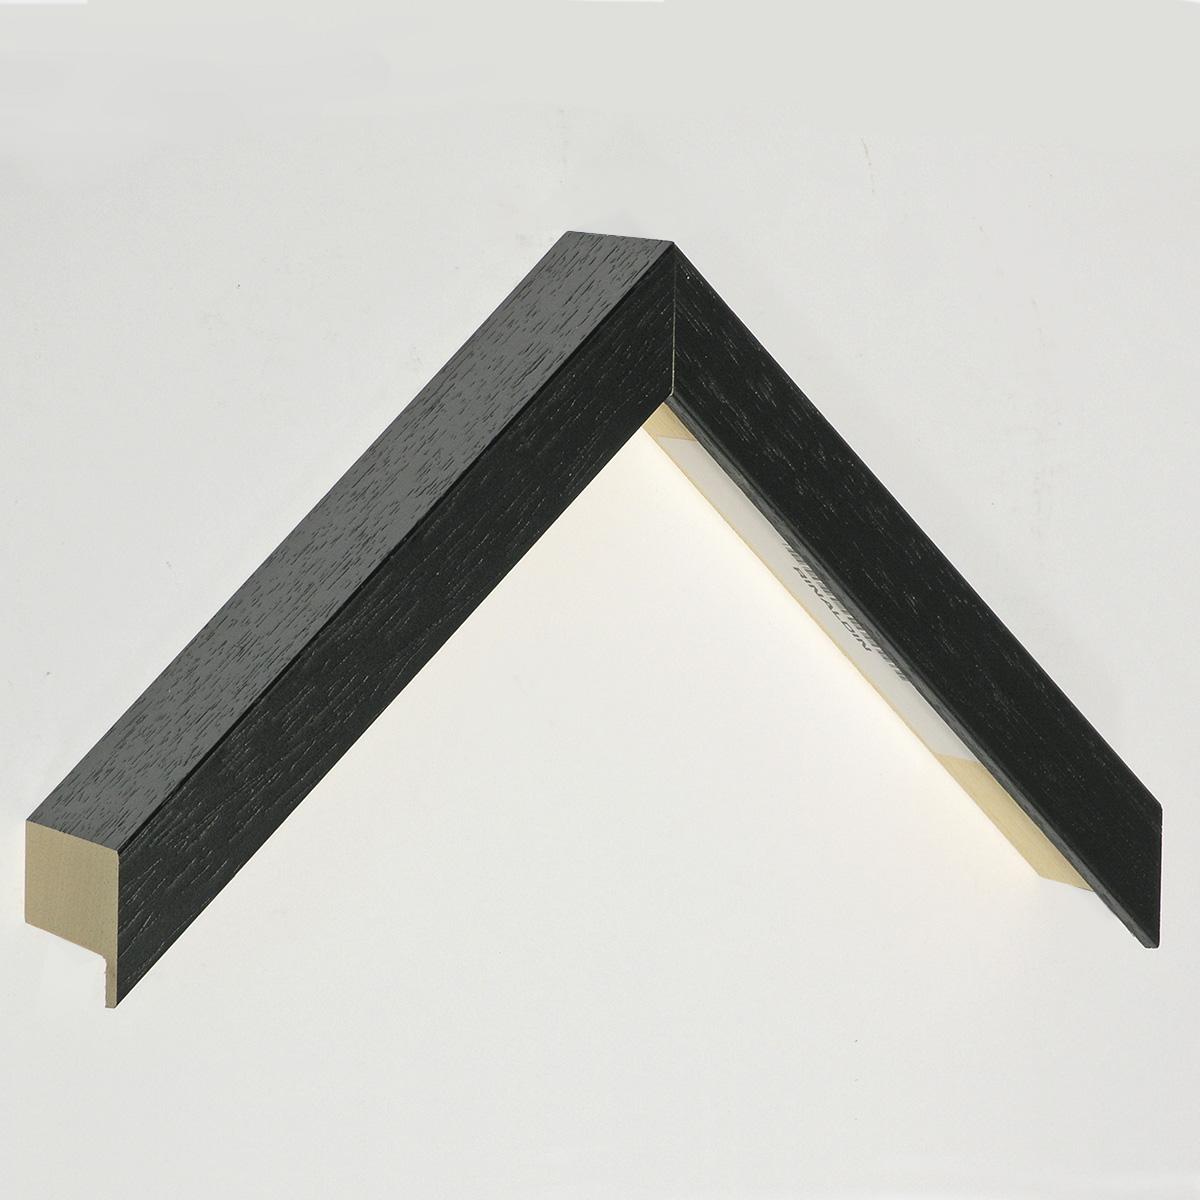 Moulding ayous Width 20mm Height 45 - black, open grain